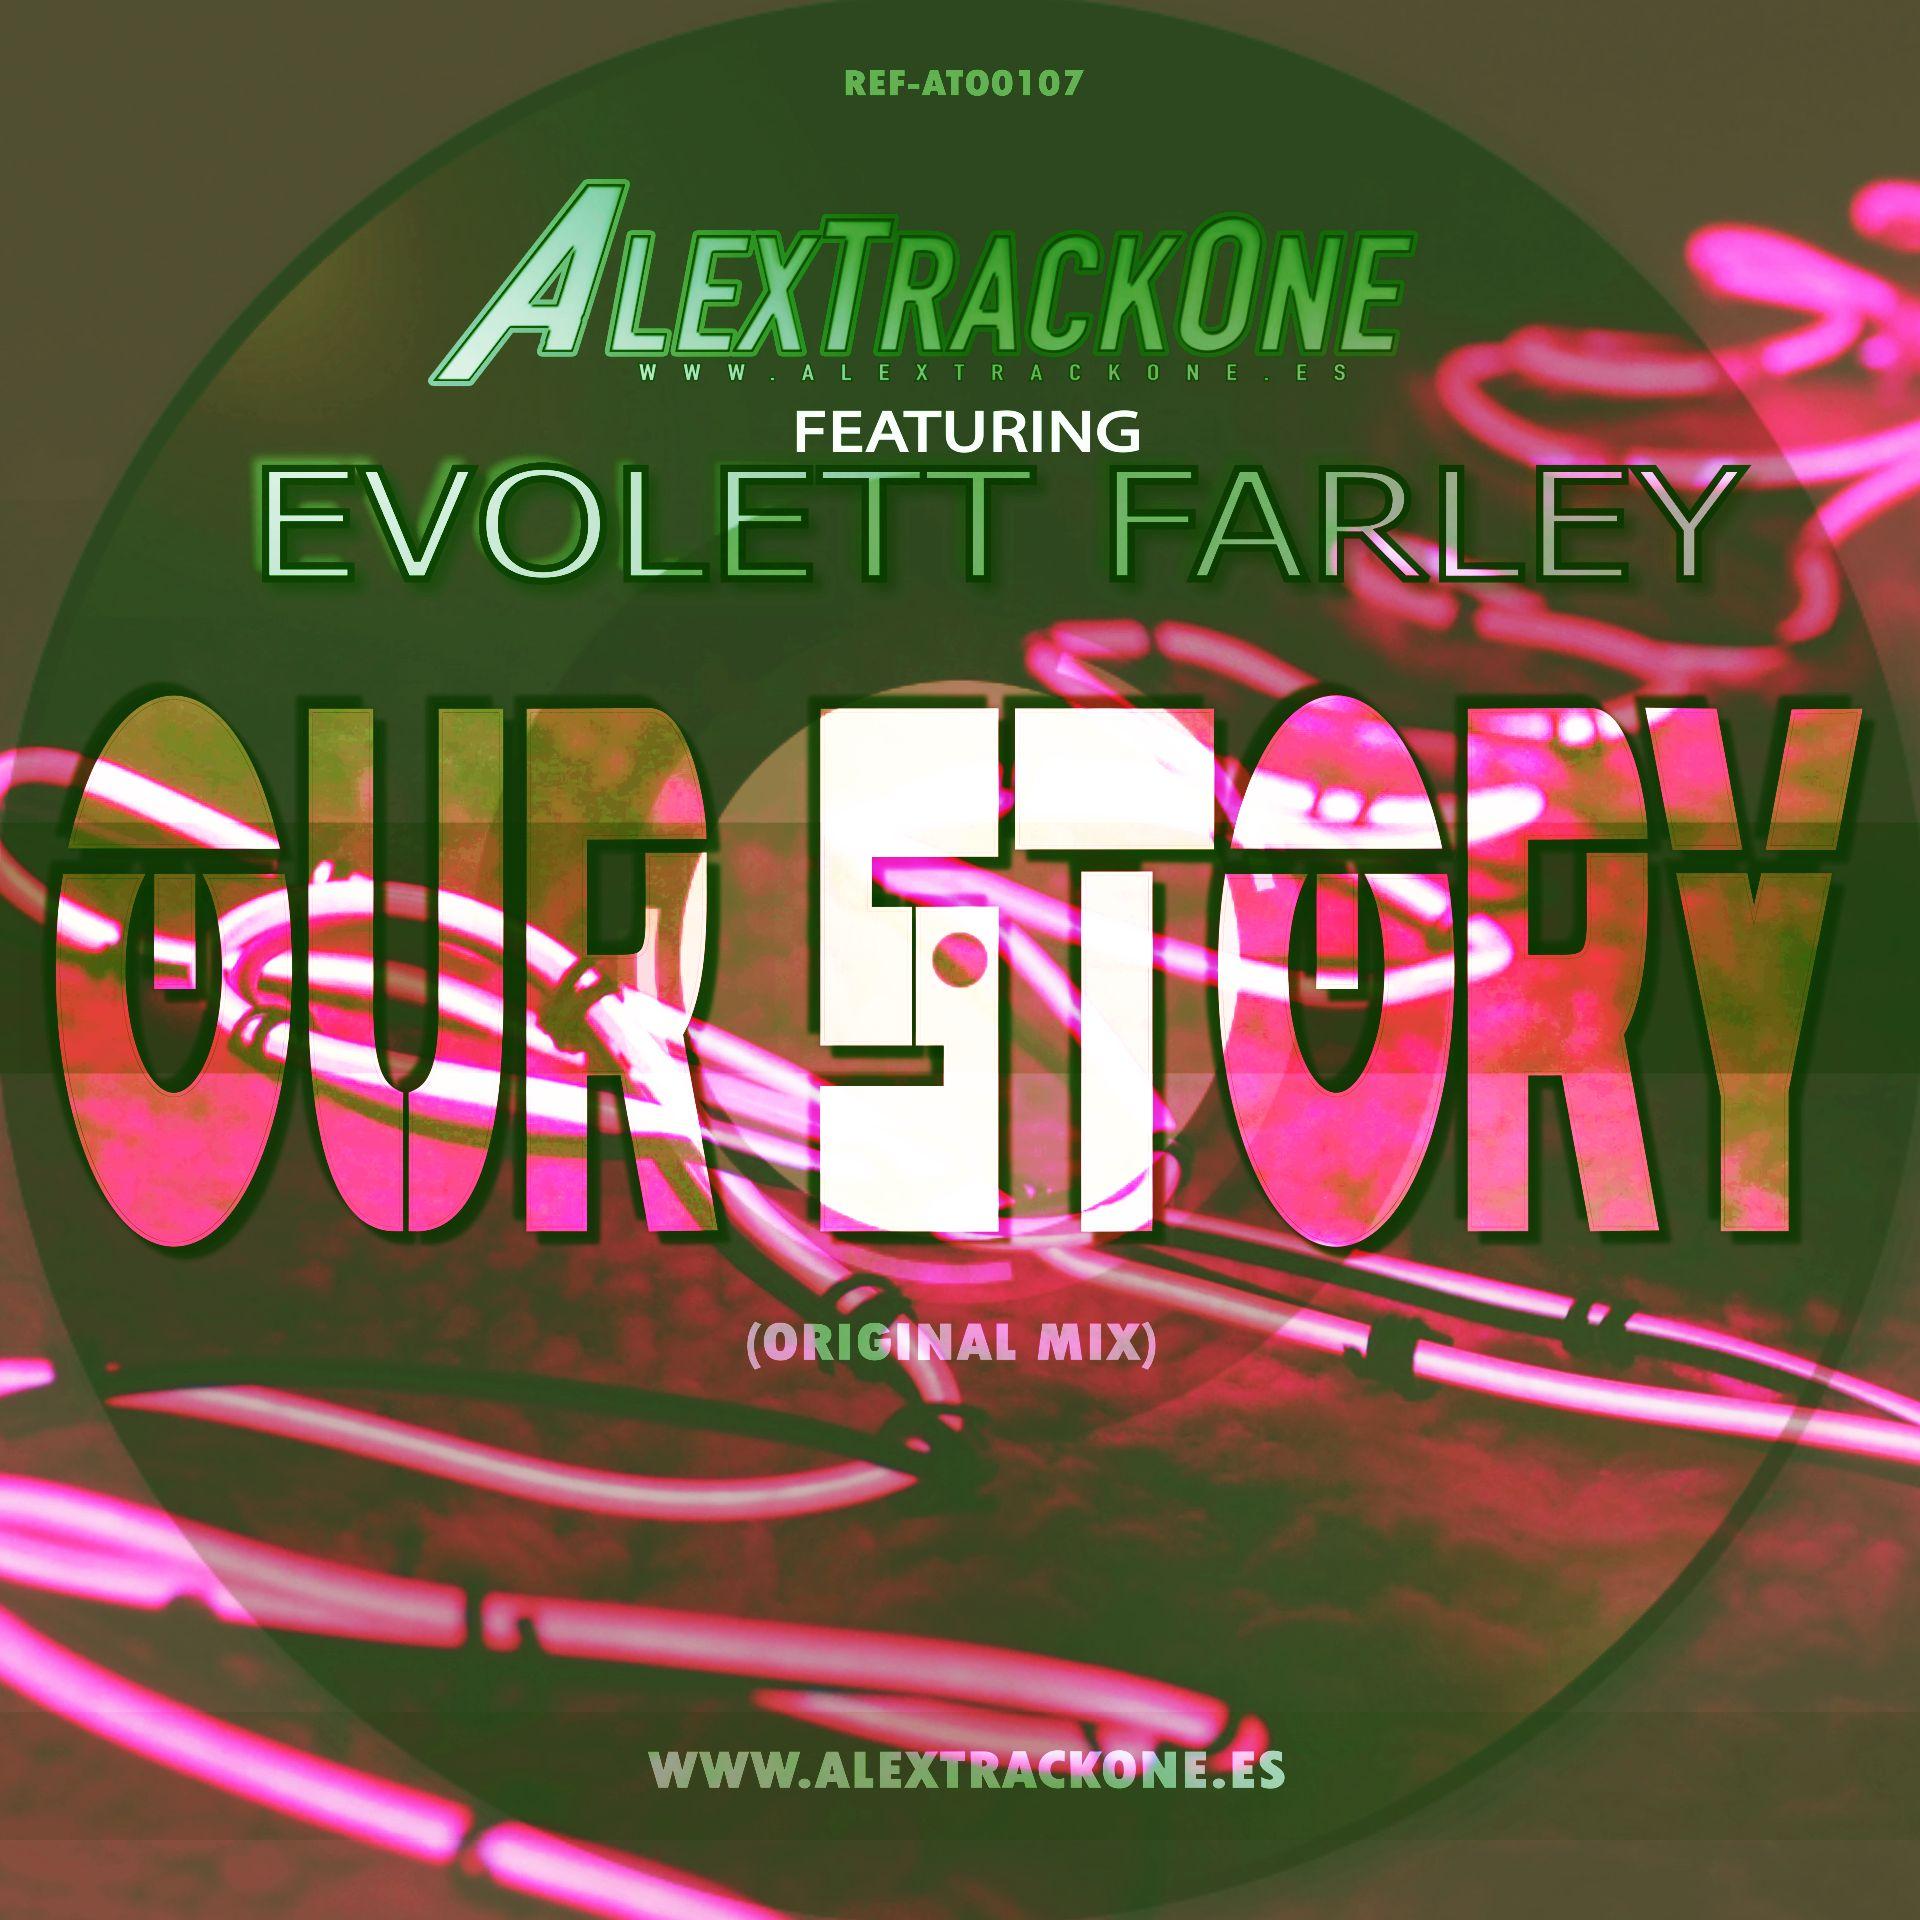 REF-ATO0107 FEAT EVOLETT FARLEY - OUR STORY (ORIGINAL MIX) (MP3 & WAV & FLAC)